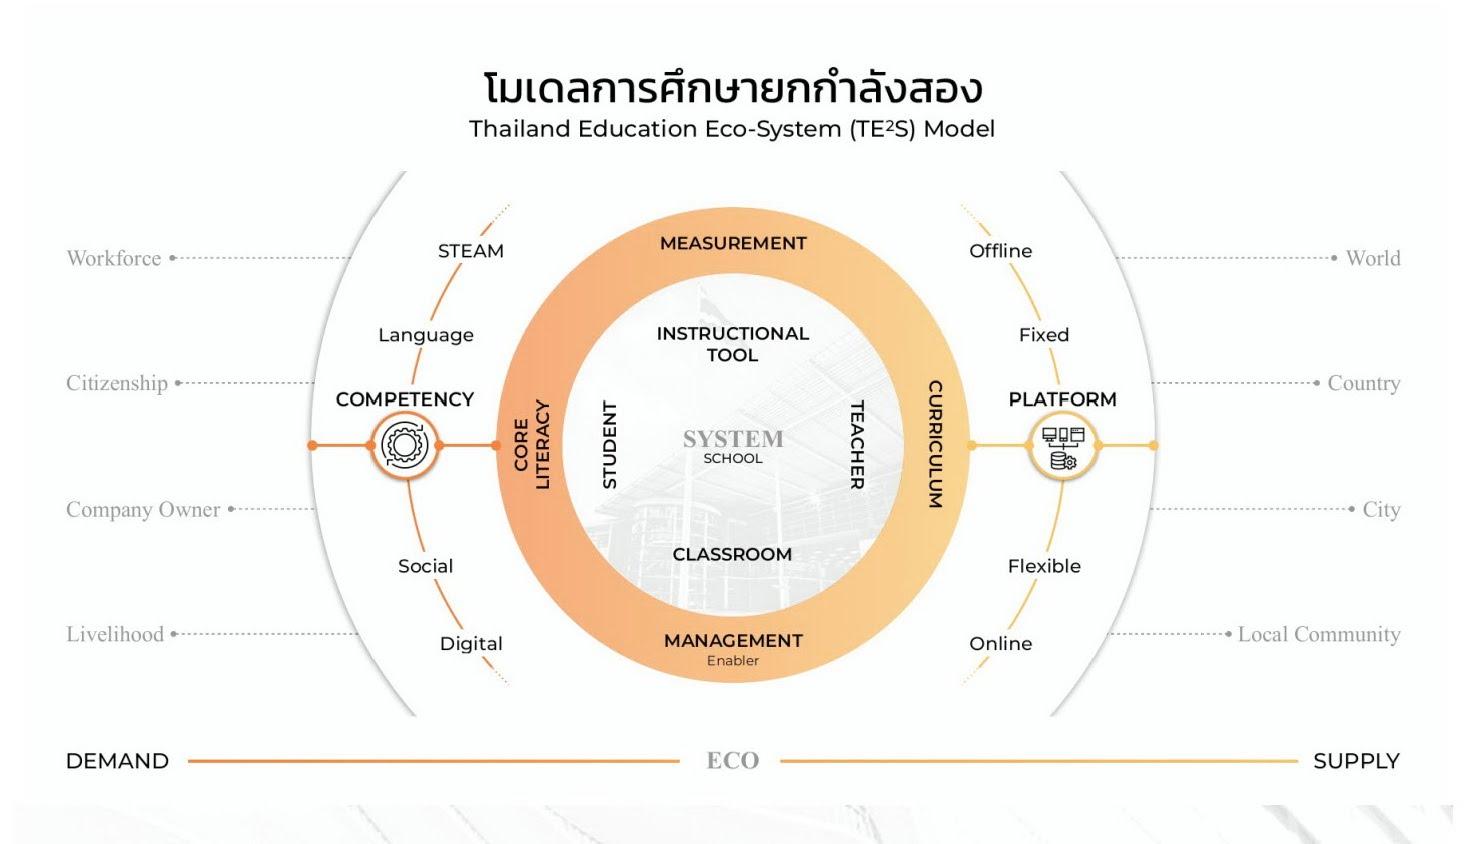 https://sites.google.com/a/hi-supervisory5.net/npt2/home/yk-kalang/te2sModel.jpg